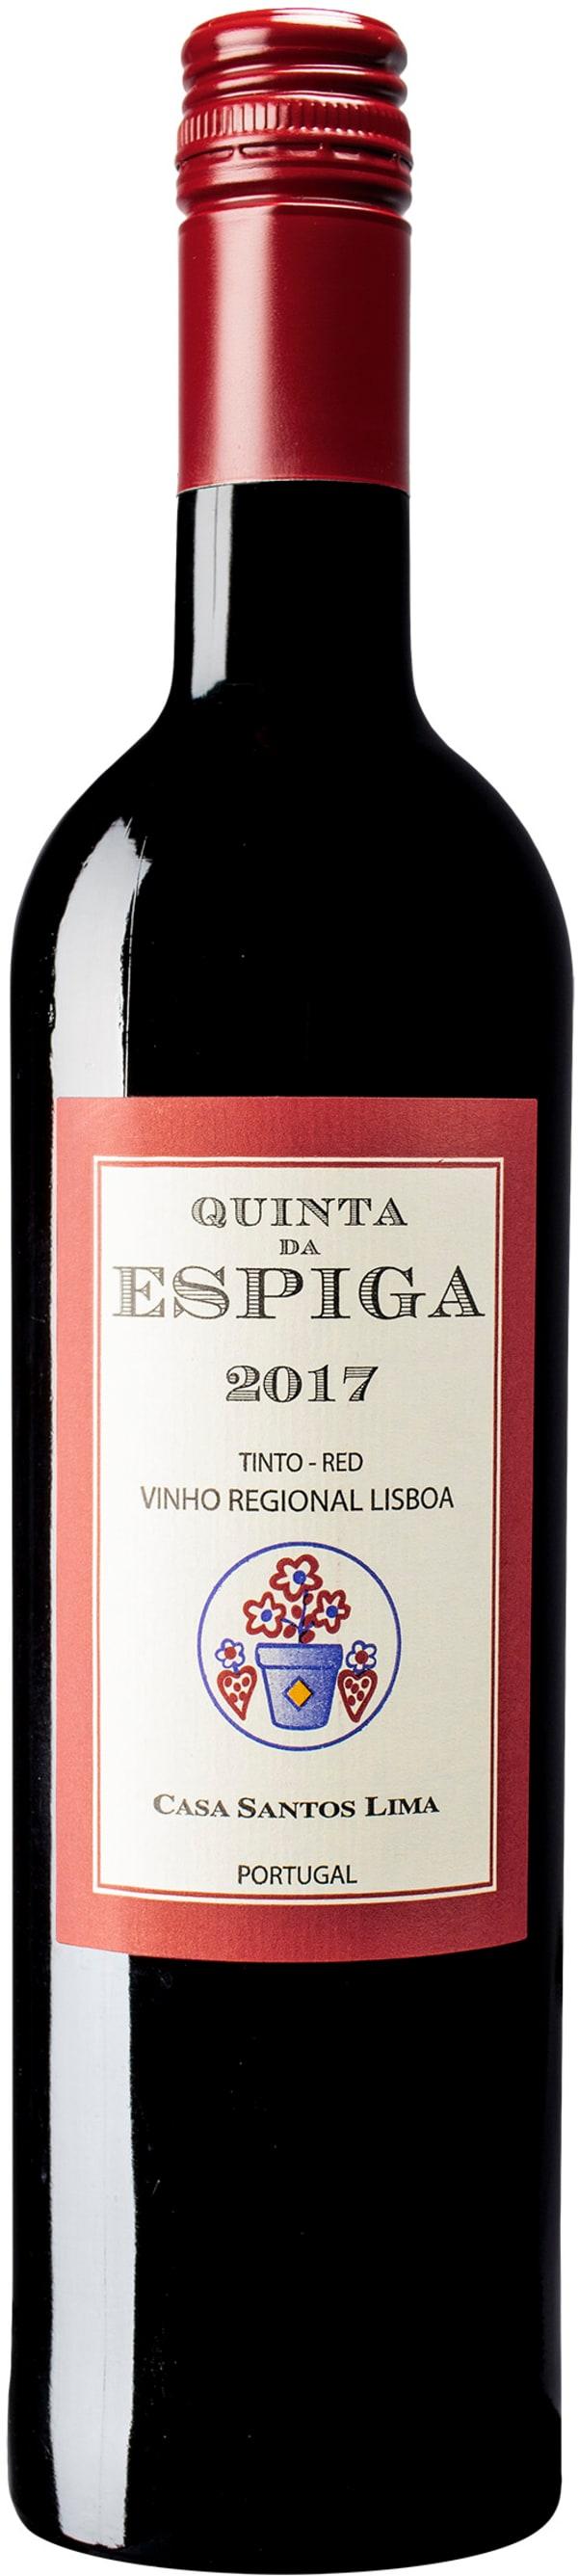 Quinta da Espiga 2017